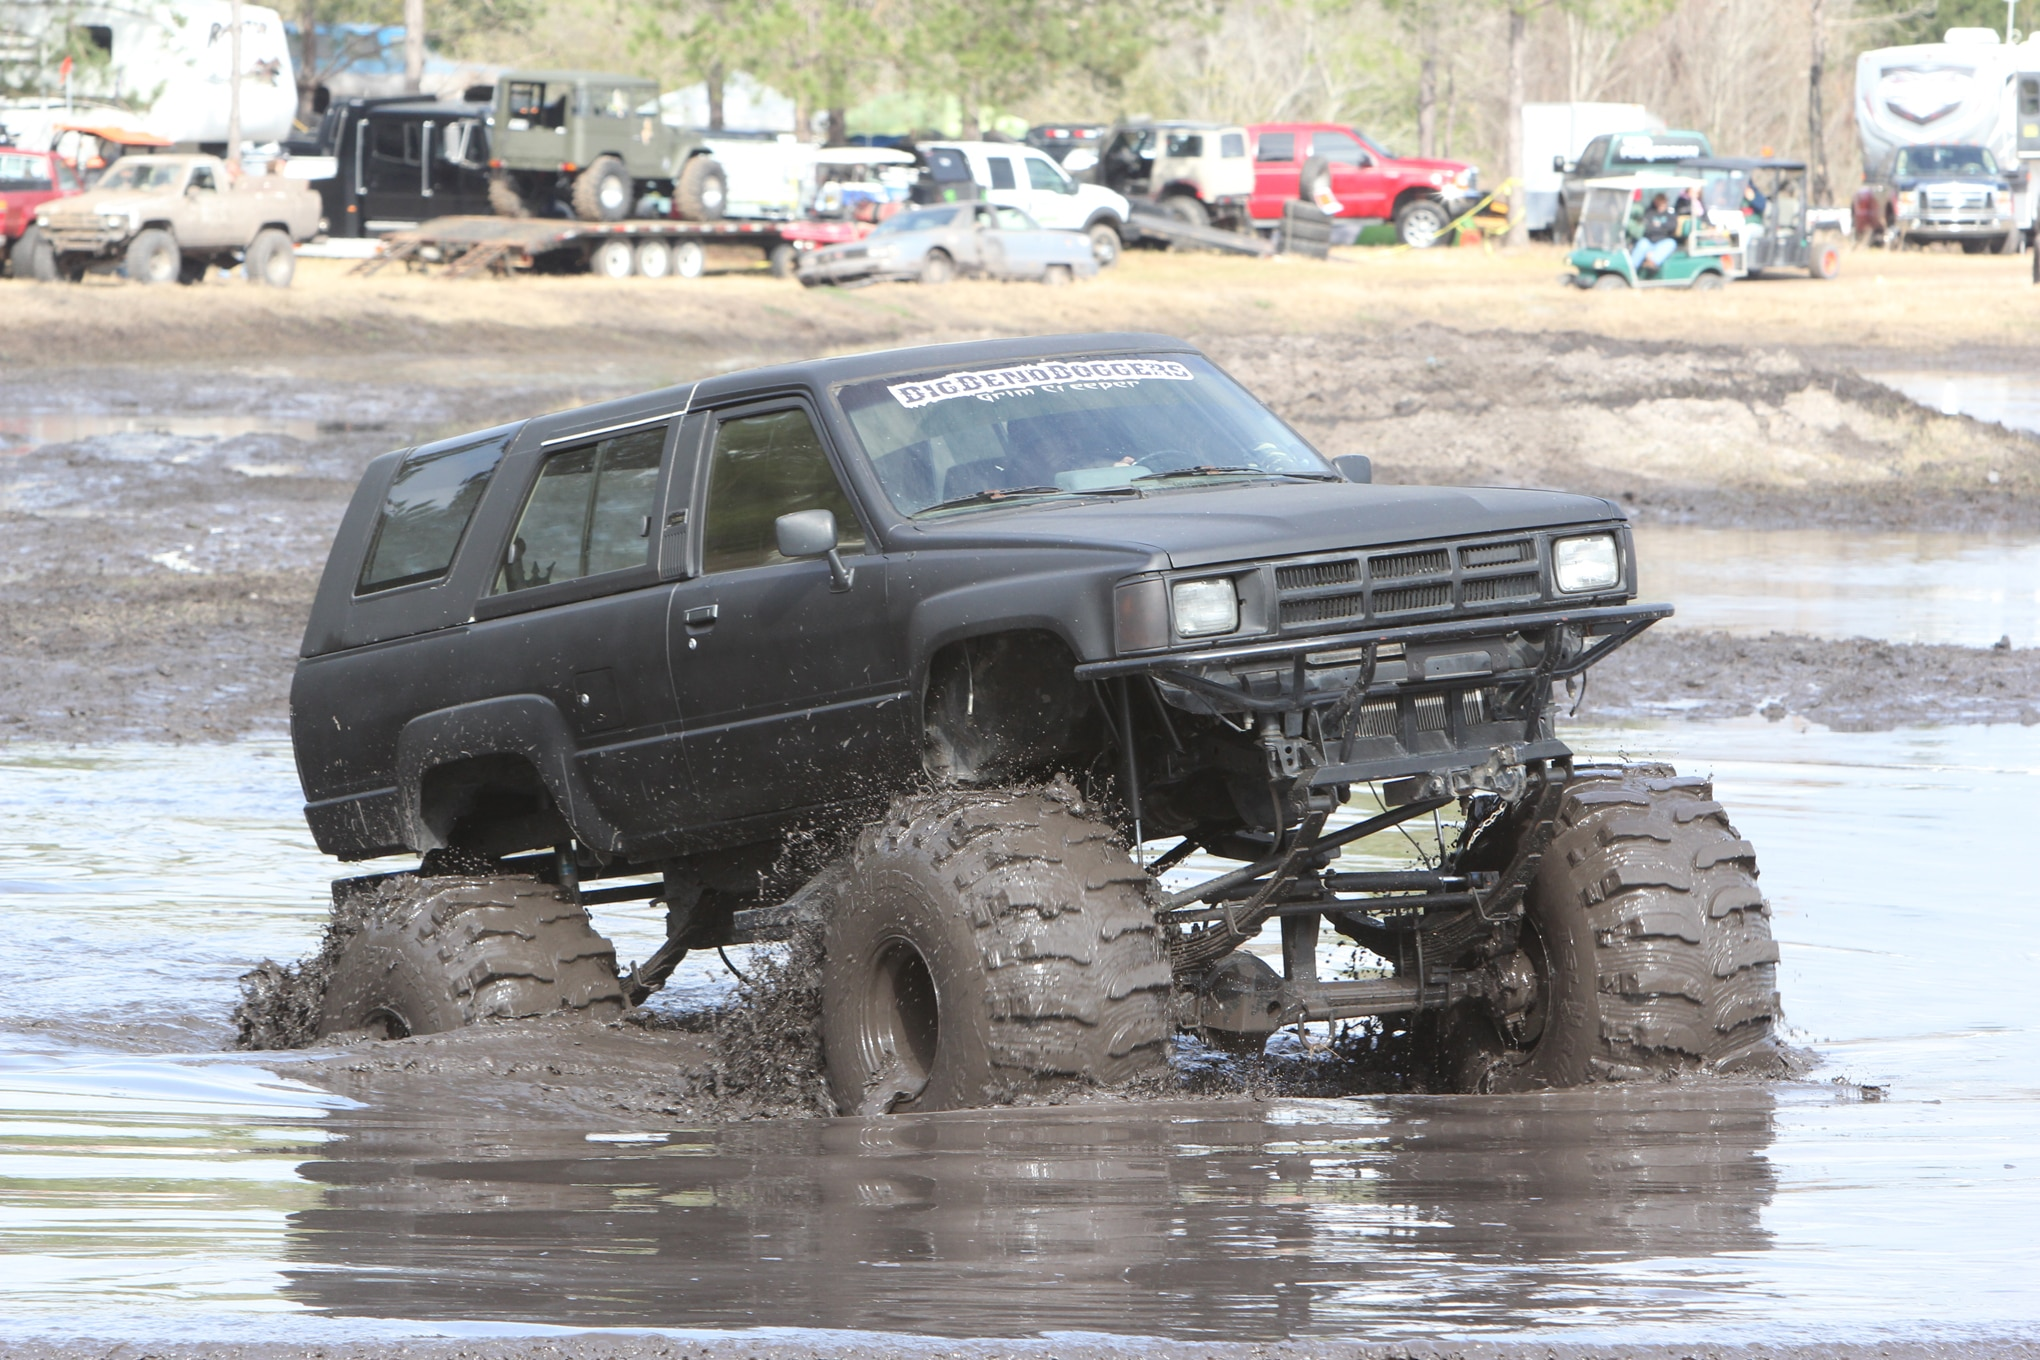 010 south berlin mud ranch 2016